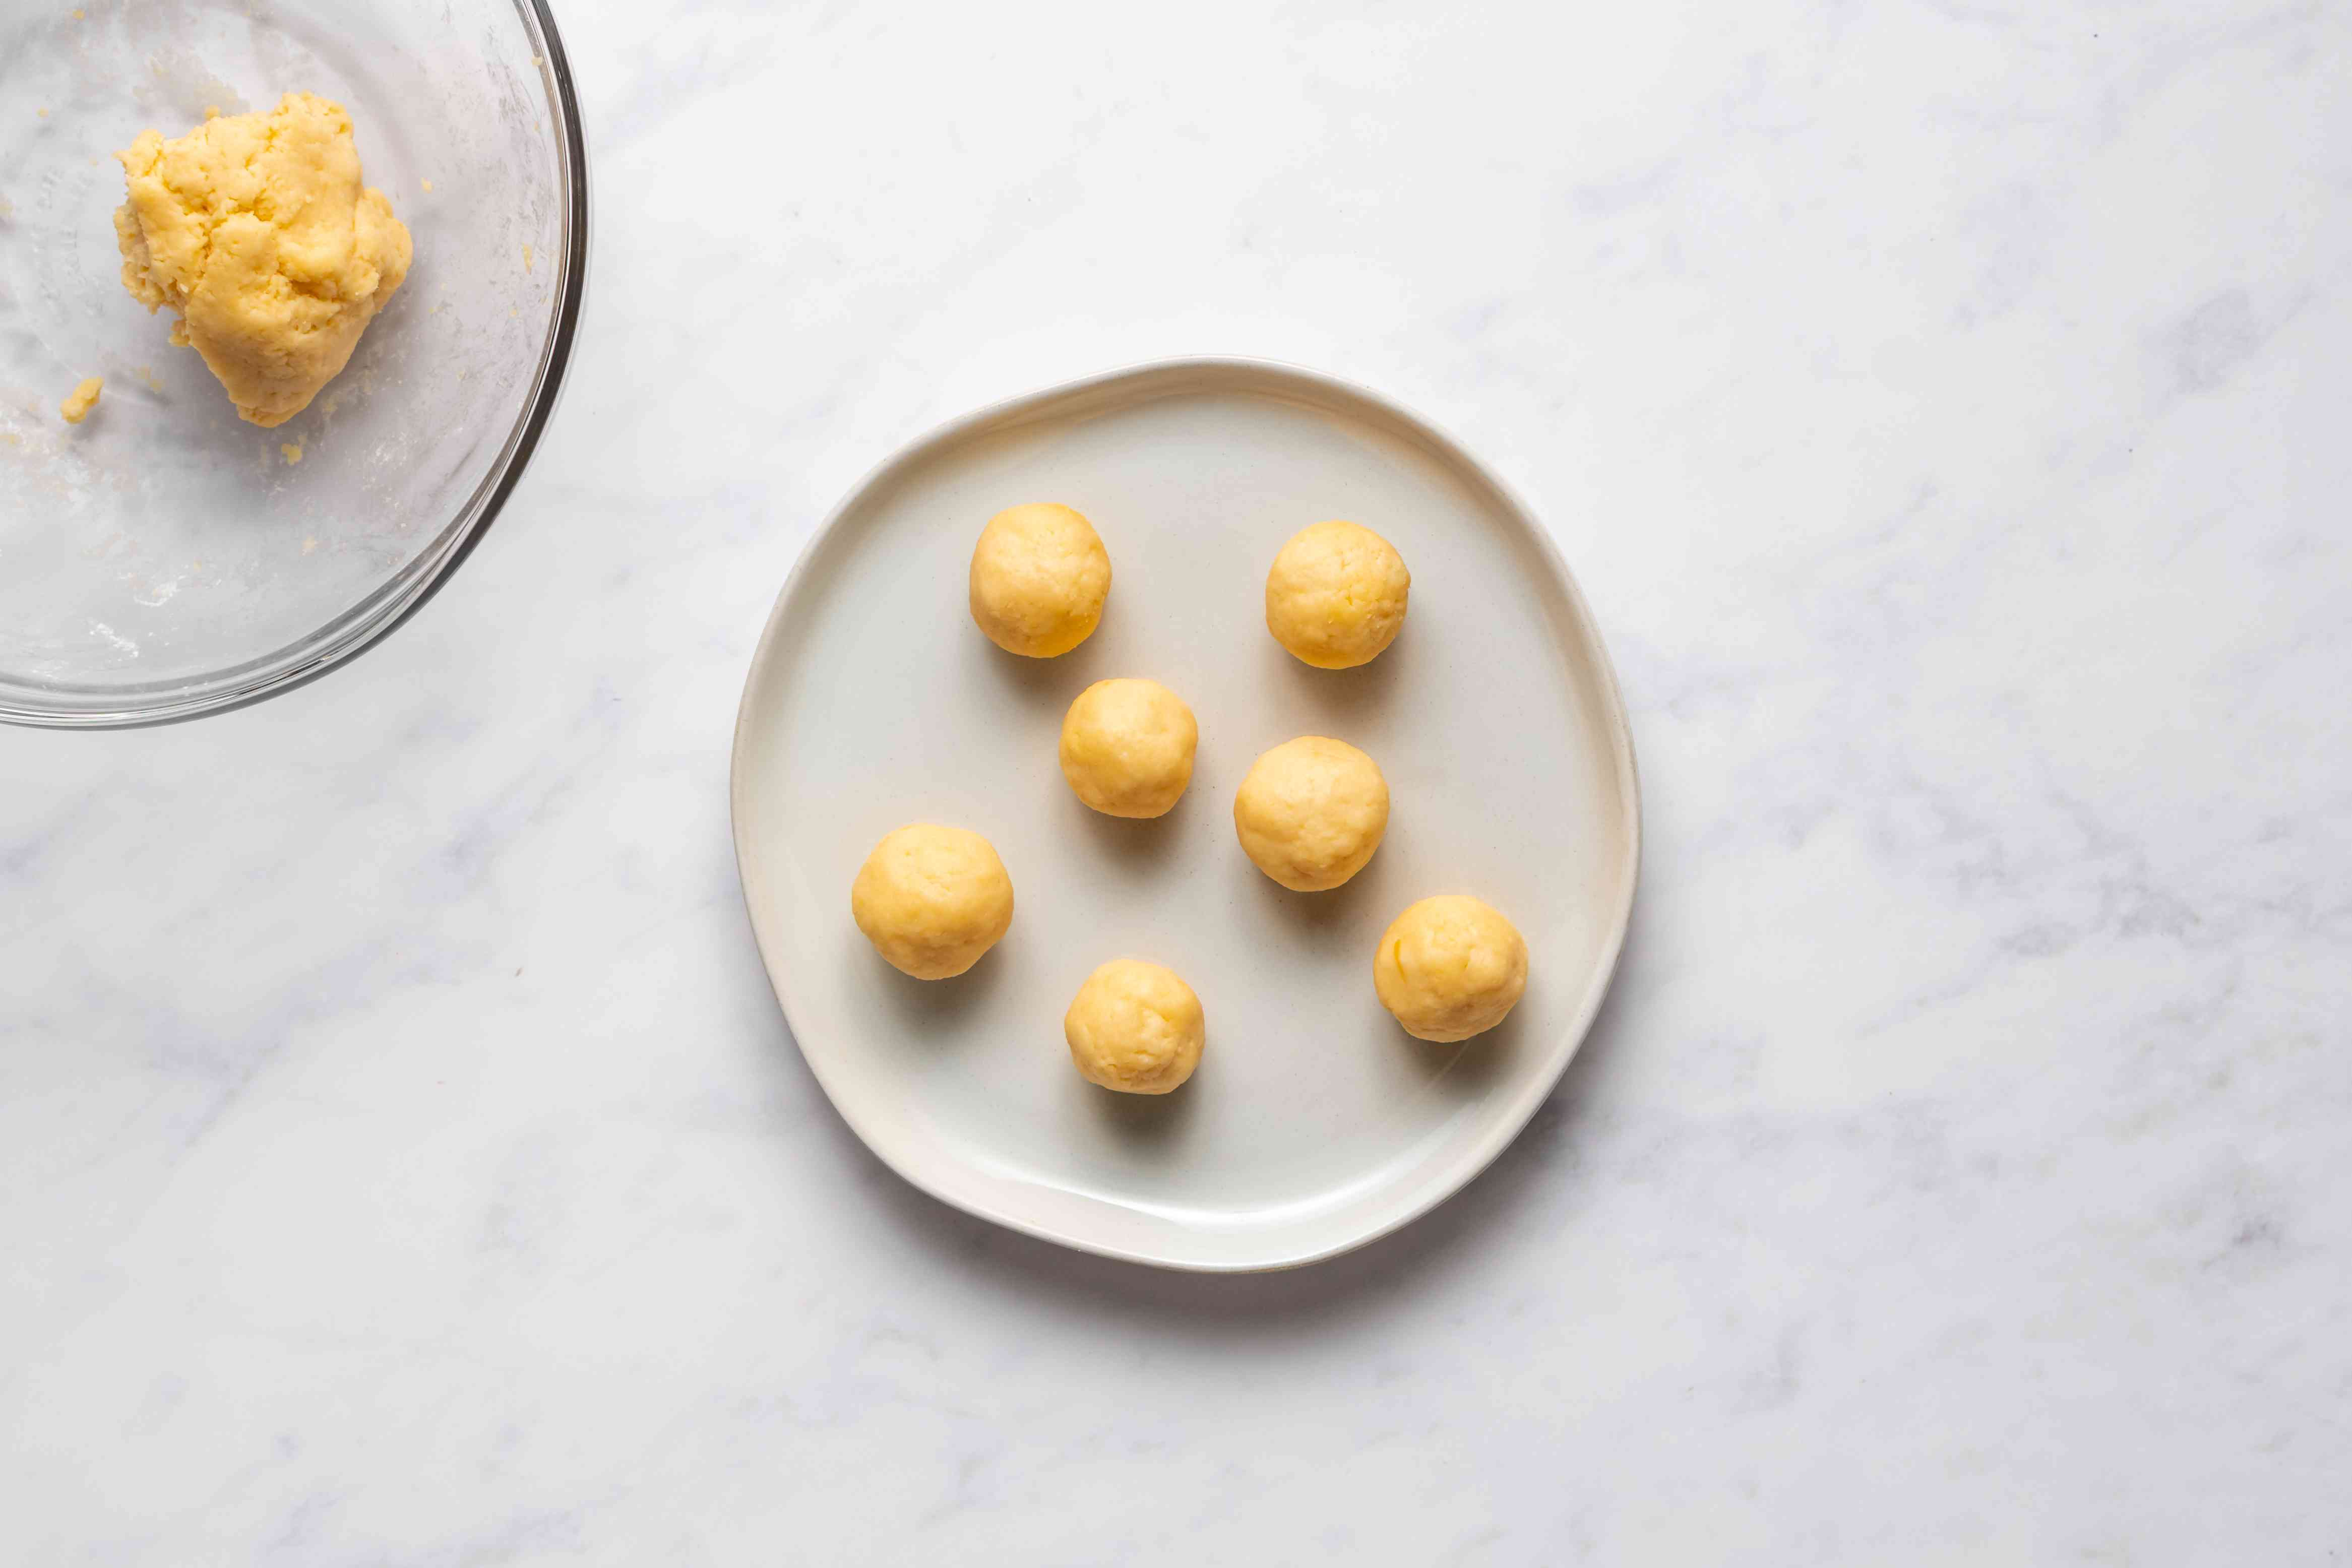 dough balls on a plate